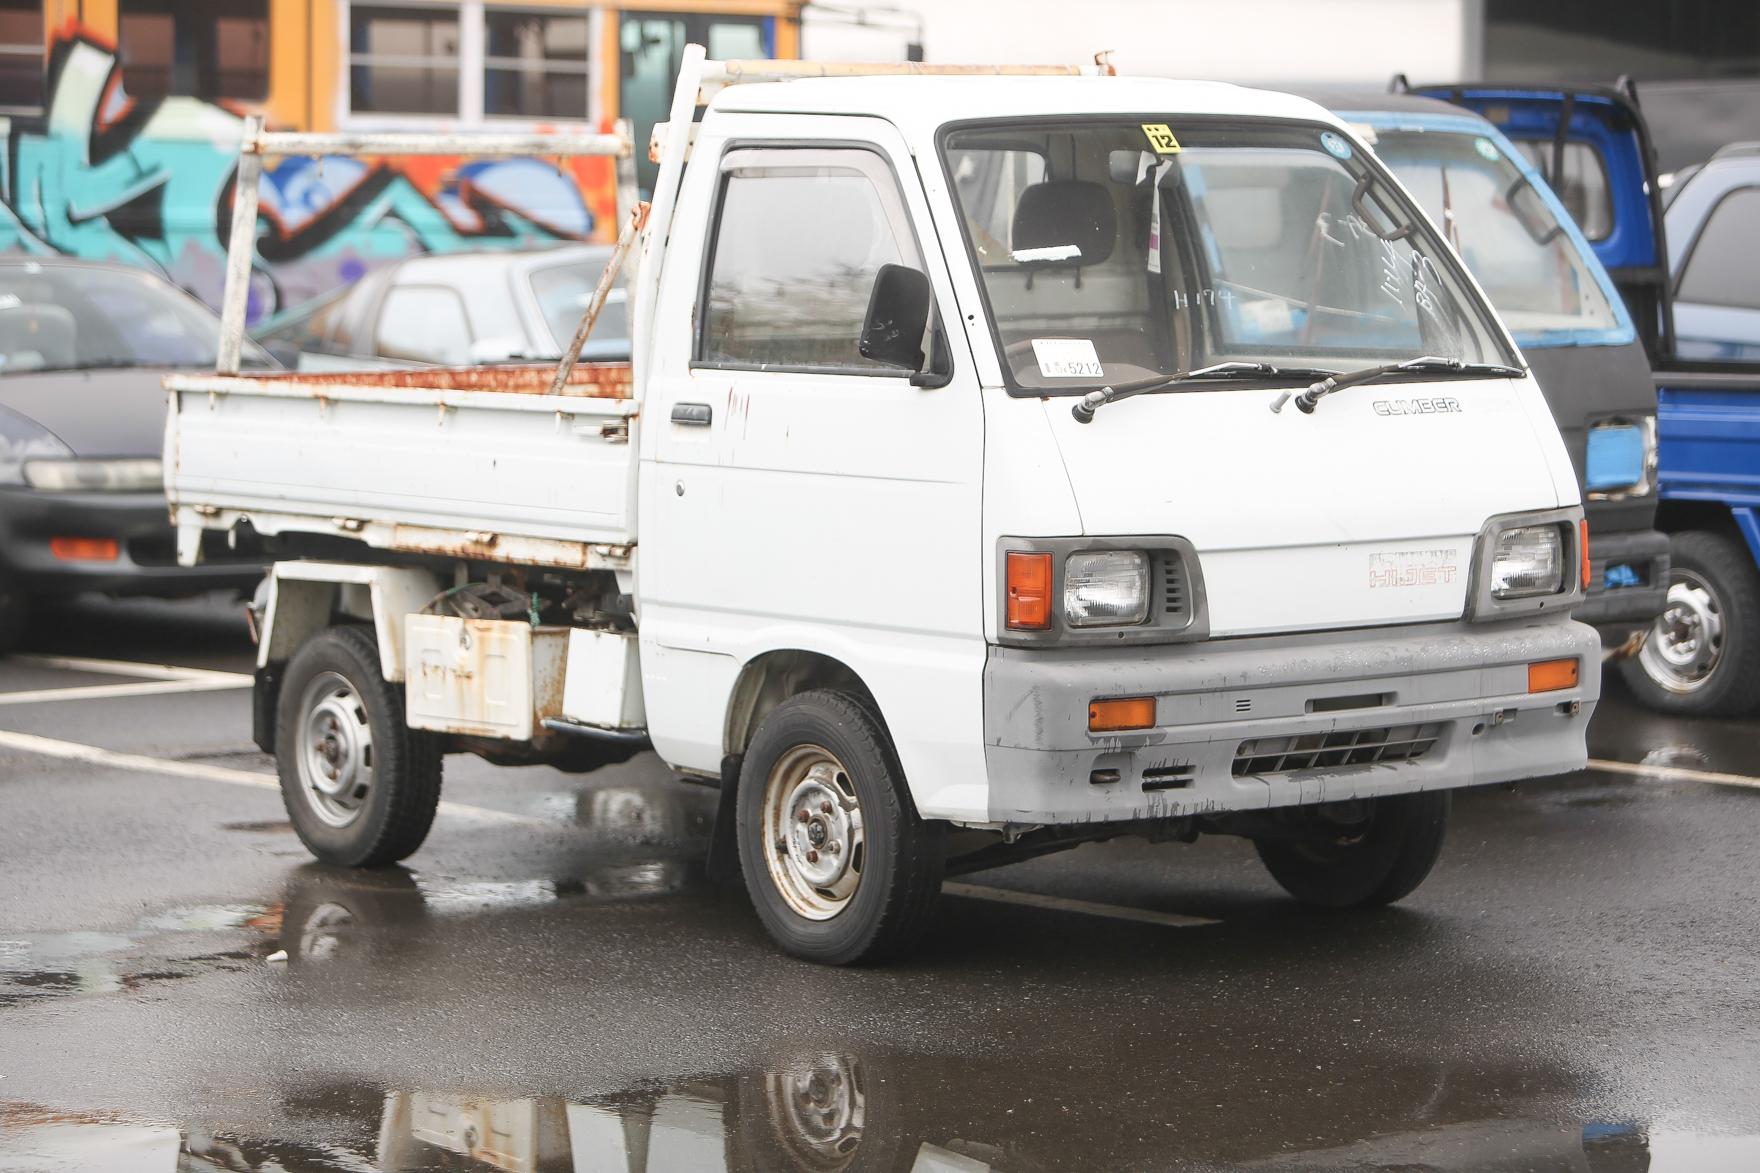 1990 Daihatsu Hijet CLIMBER Dump bed with Scissor Lift - $15,500